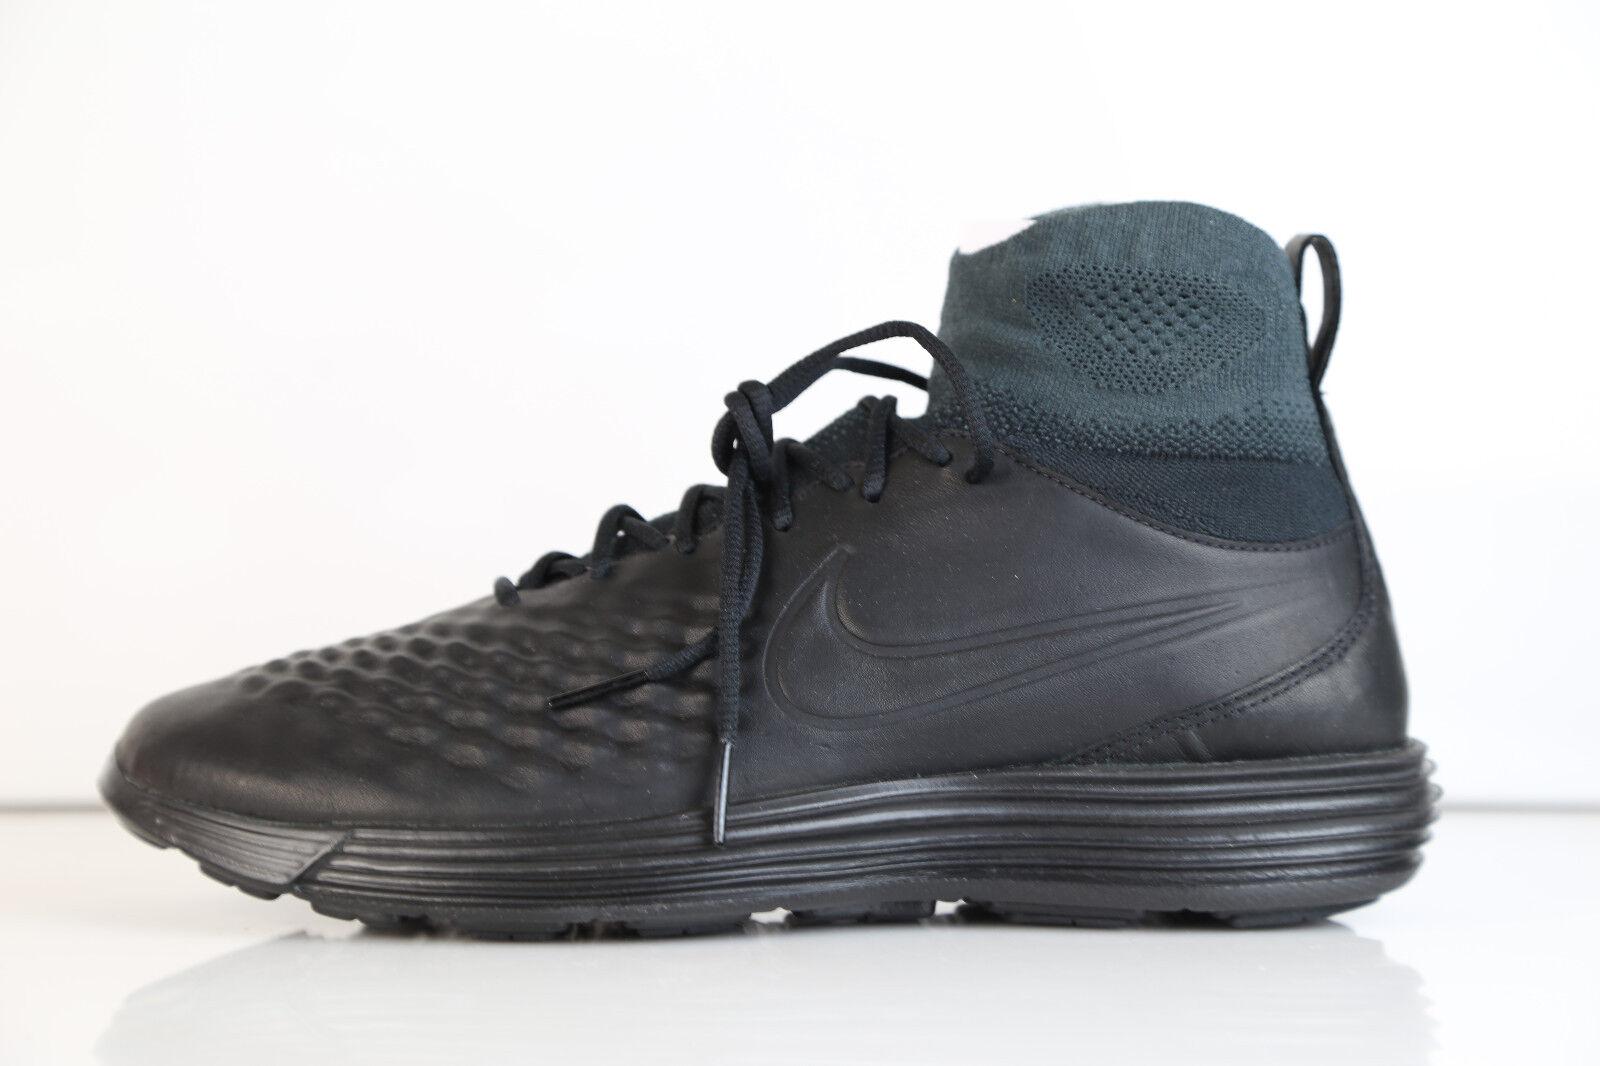 Nike Lunar Magista II FK Noir Anthracite 852614-001 8-12 free one premium